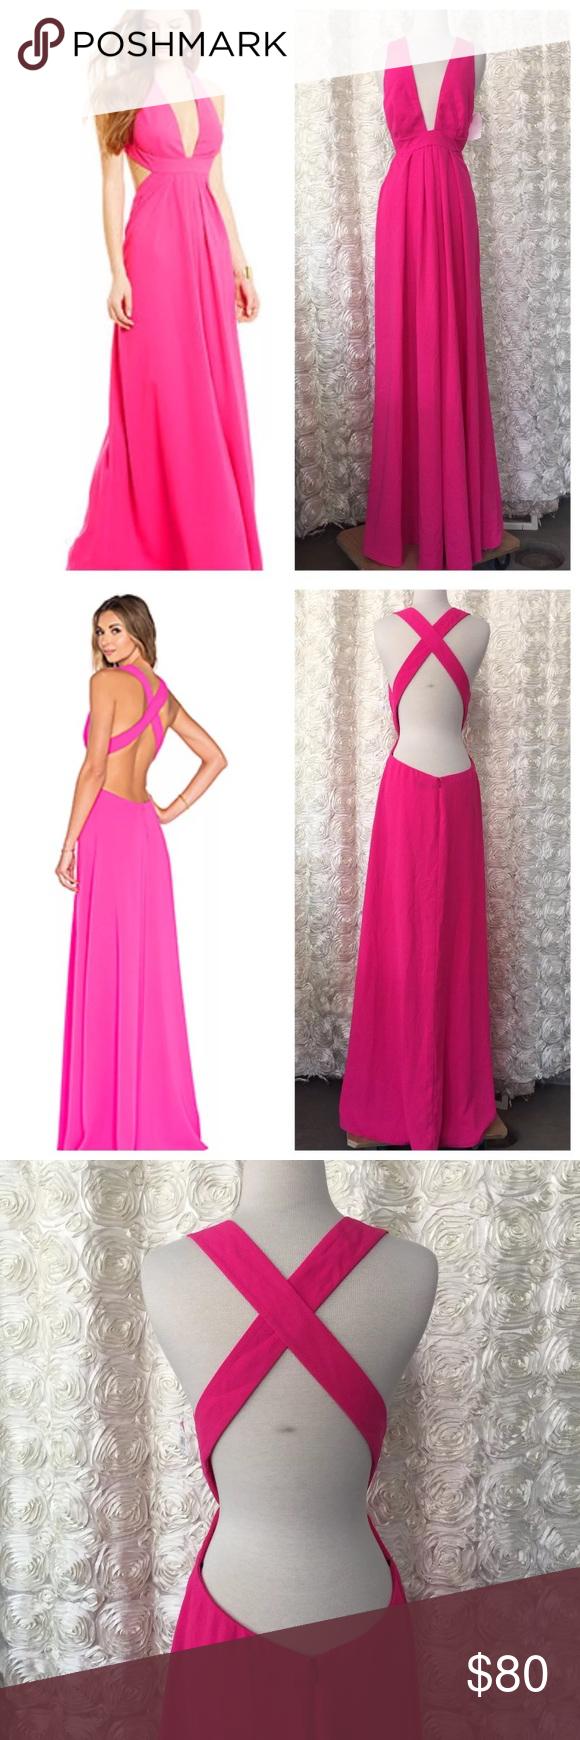 Hot pink homecoming dress  Jill Stuart Hot Pink formal dress size   My Posh Closet